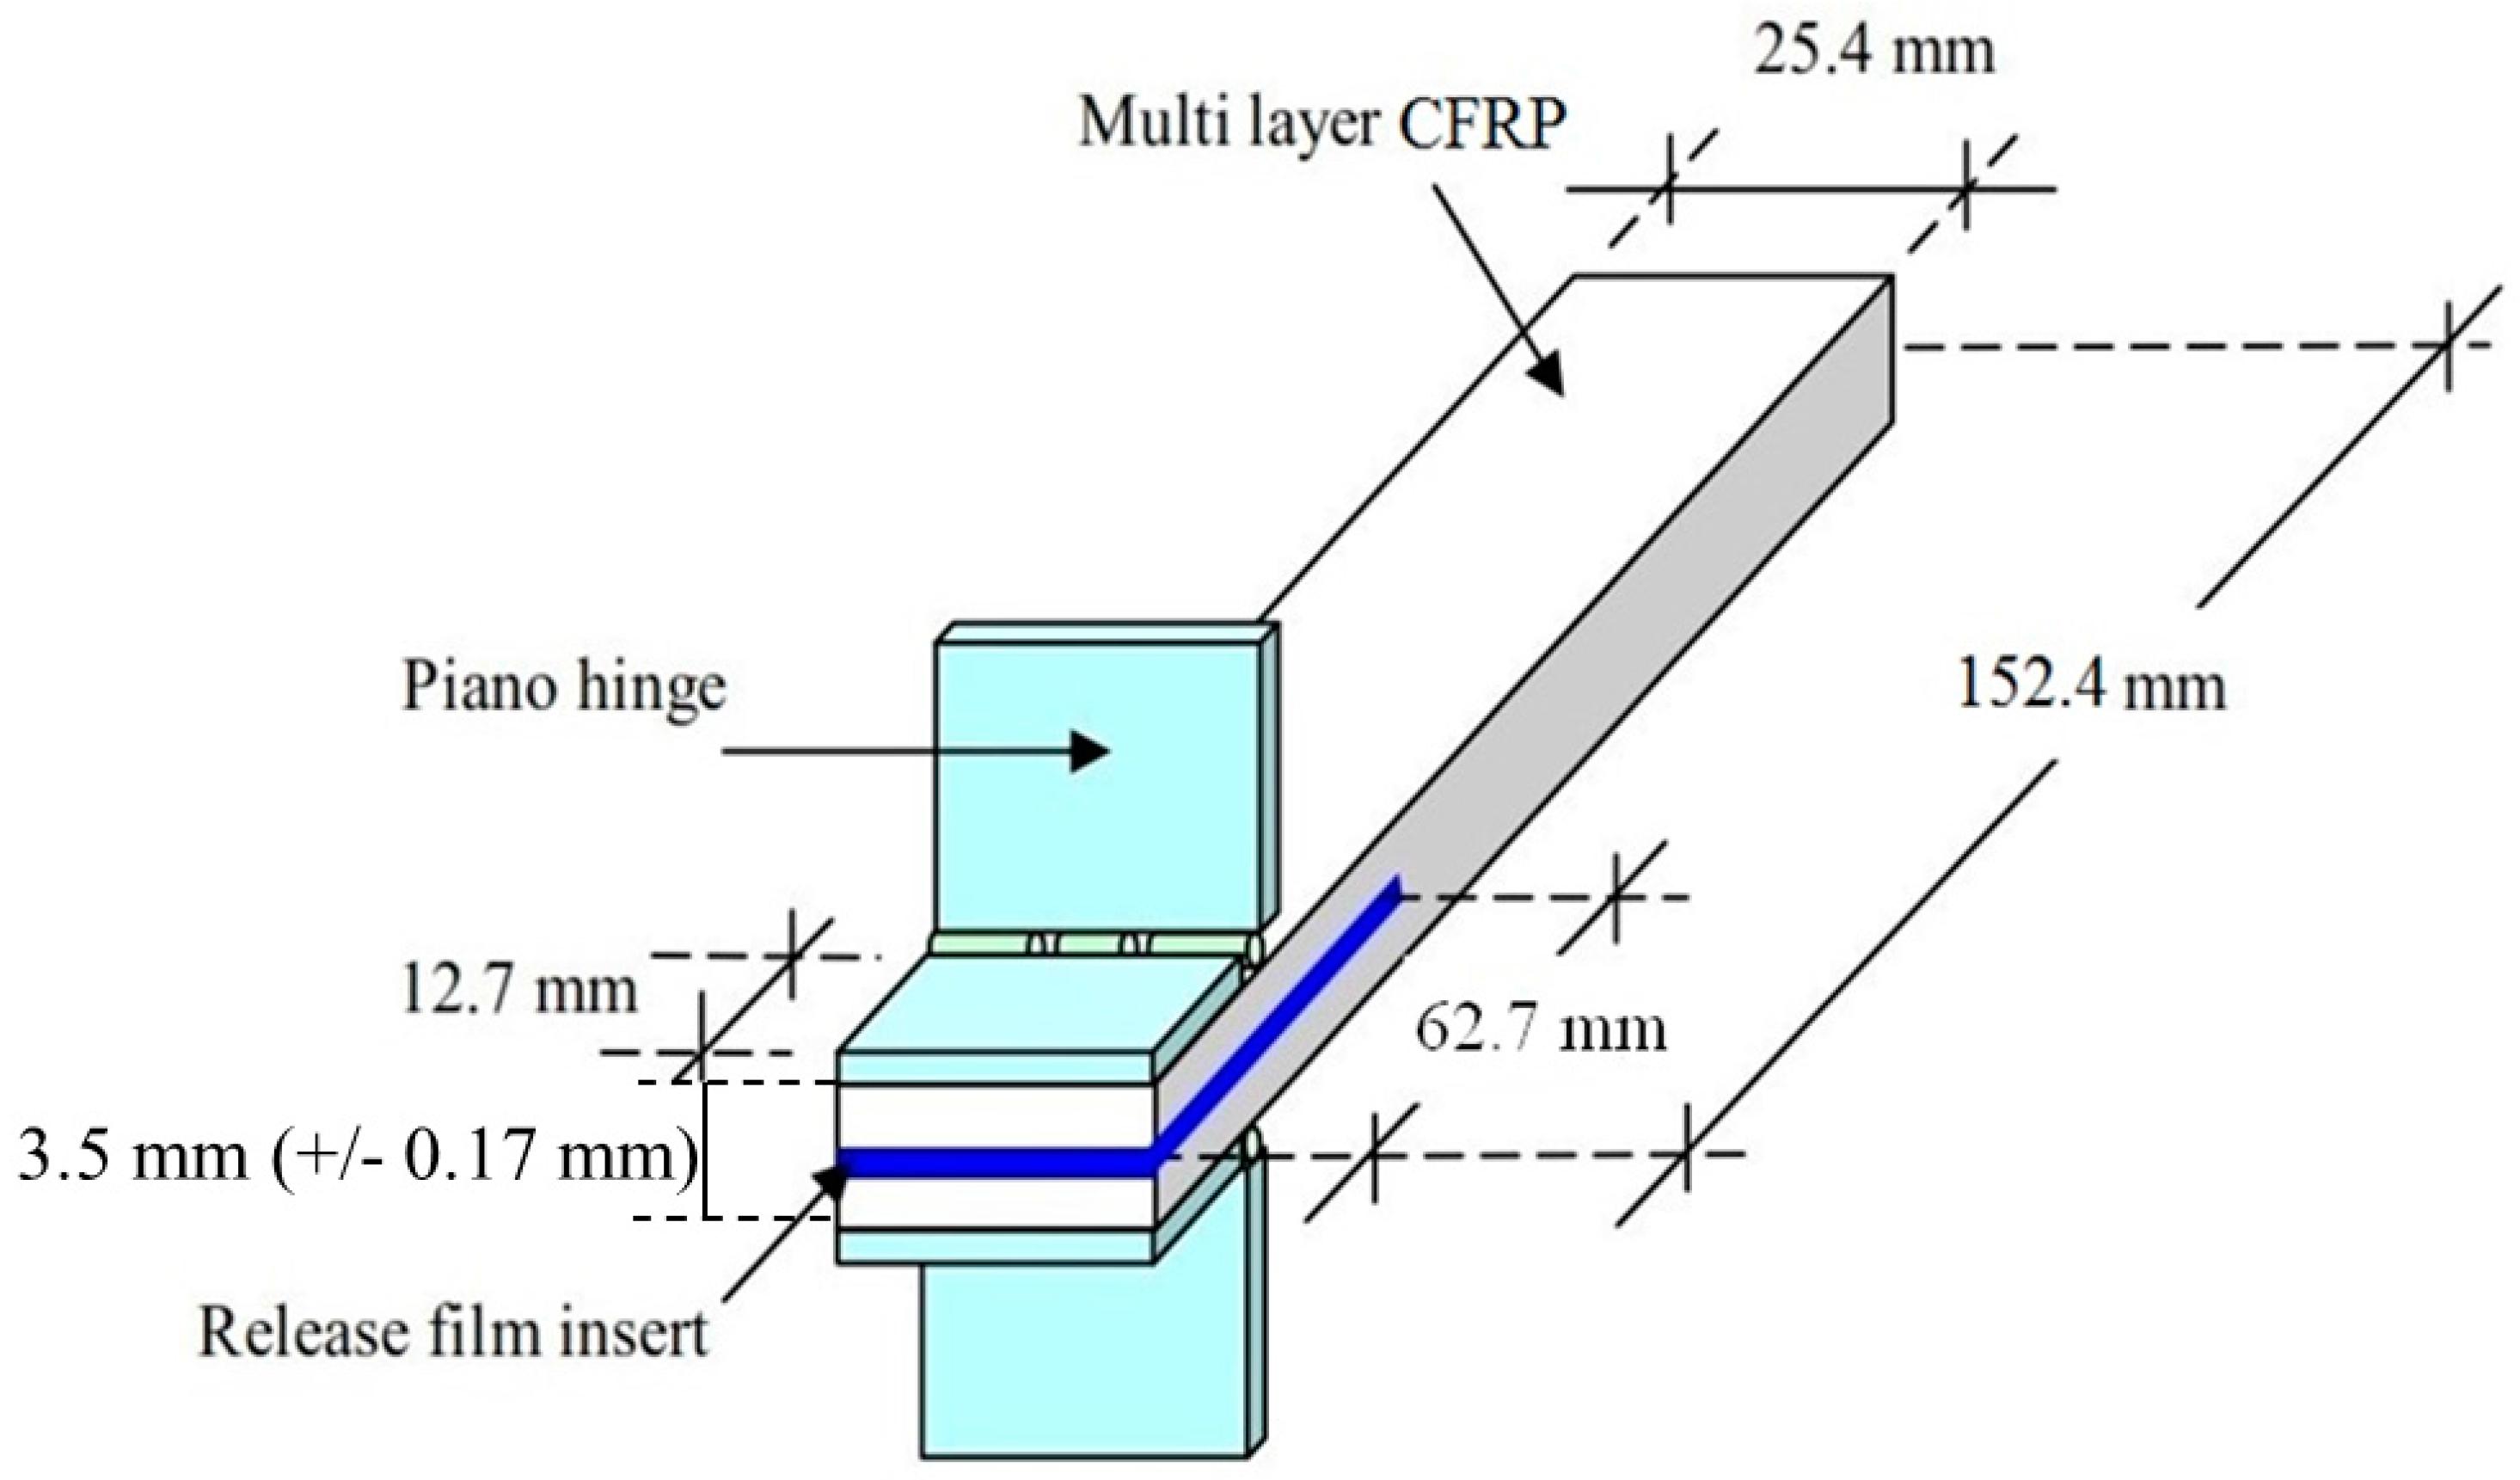 Interlaminar fracture major failure in polymer composites